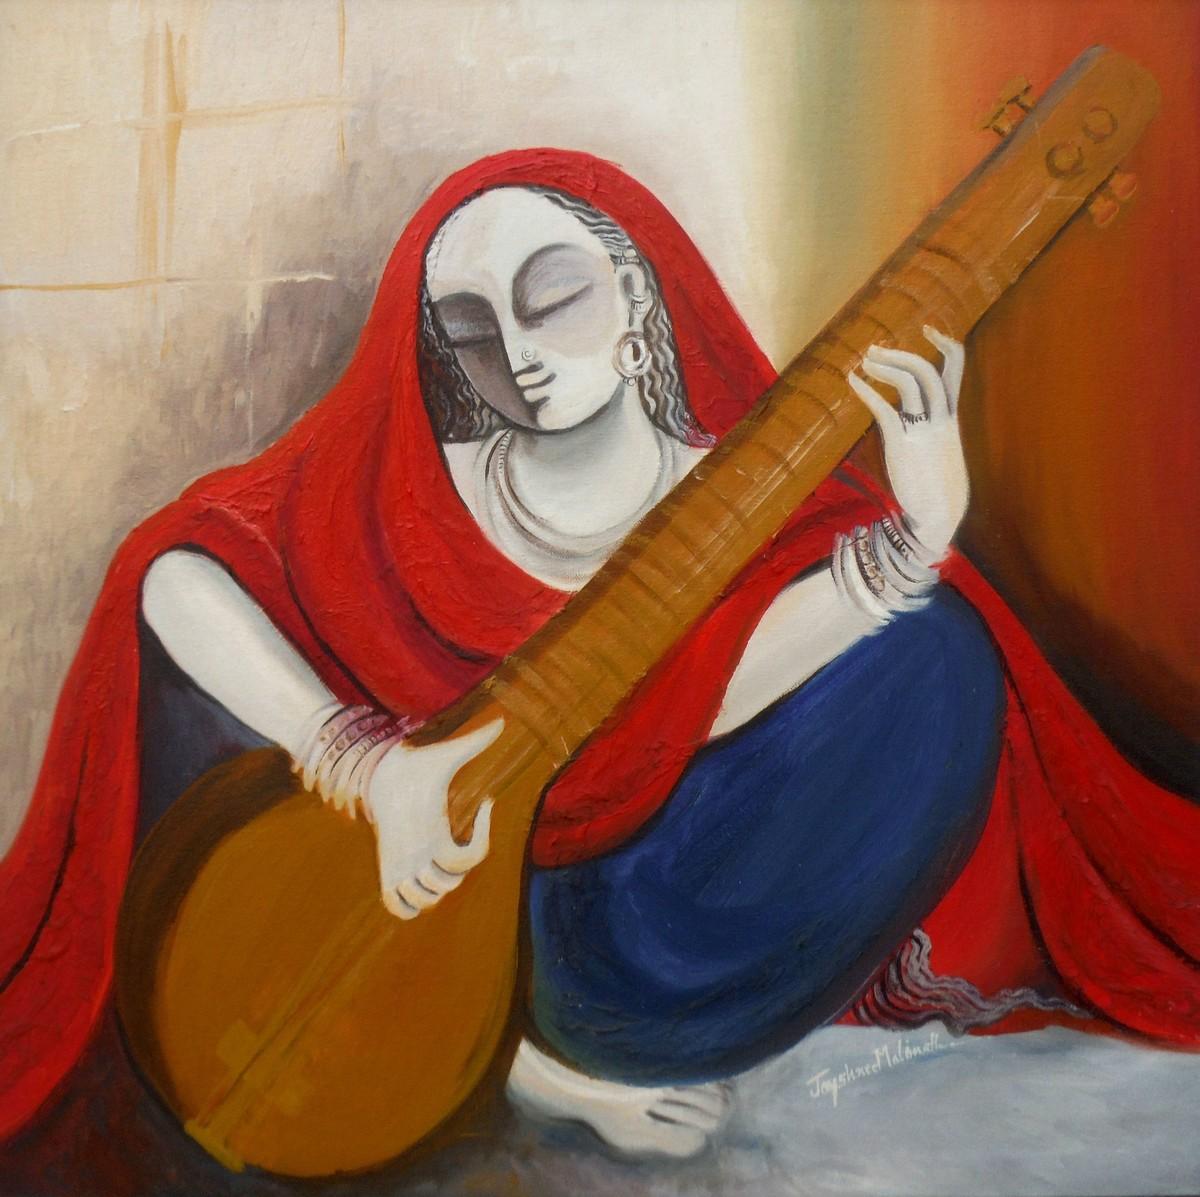 Musician 04 Digital Print by Jayshree P Malimath,Traditional, Traditional